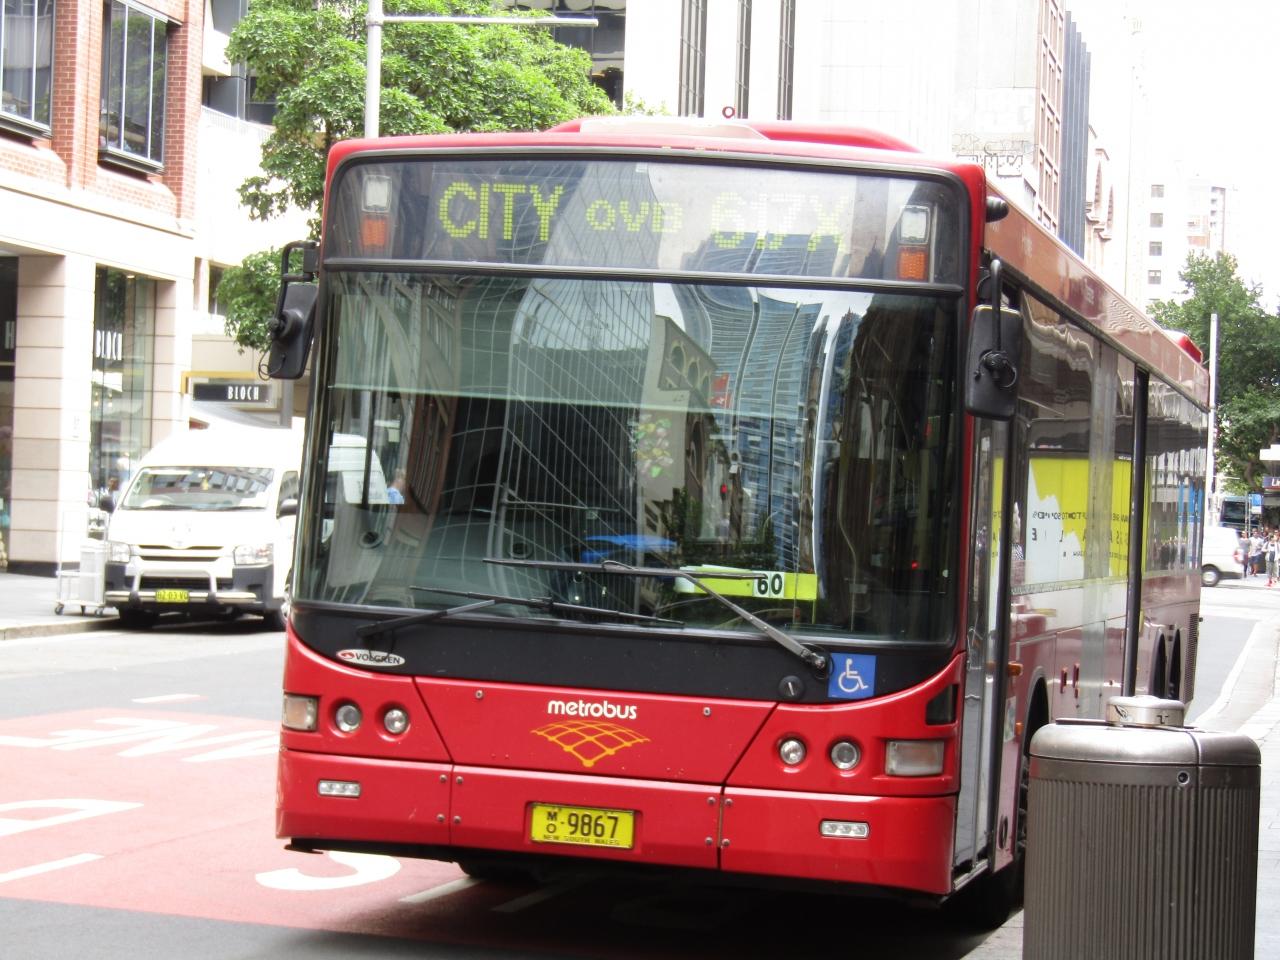 sydney bus 144 - photo#29